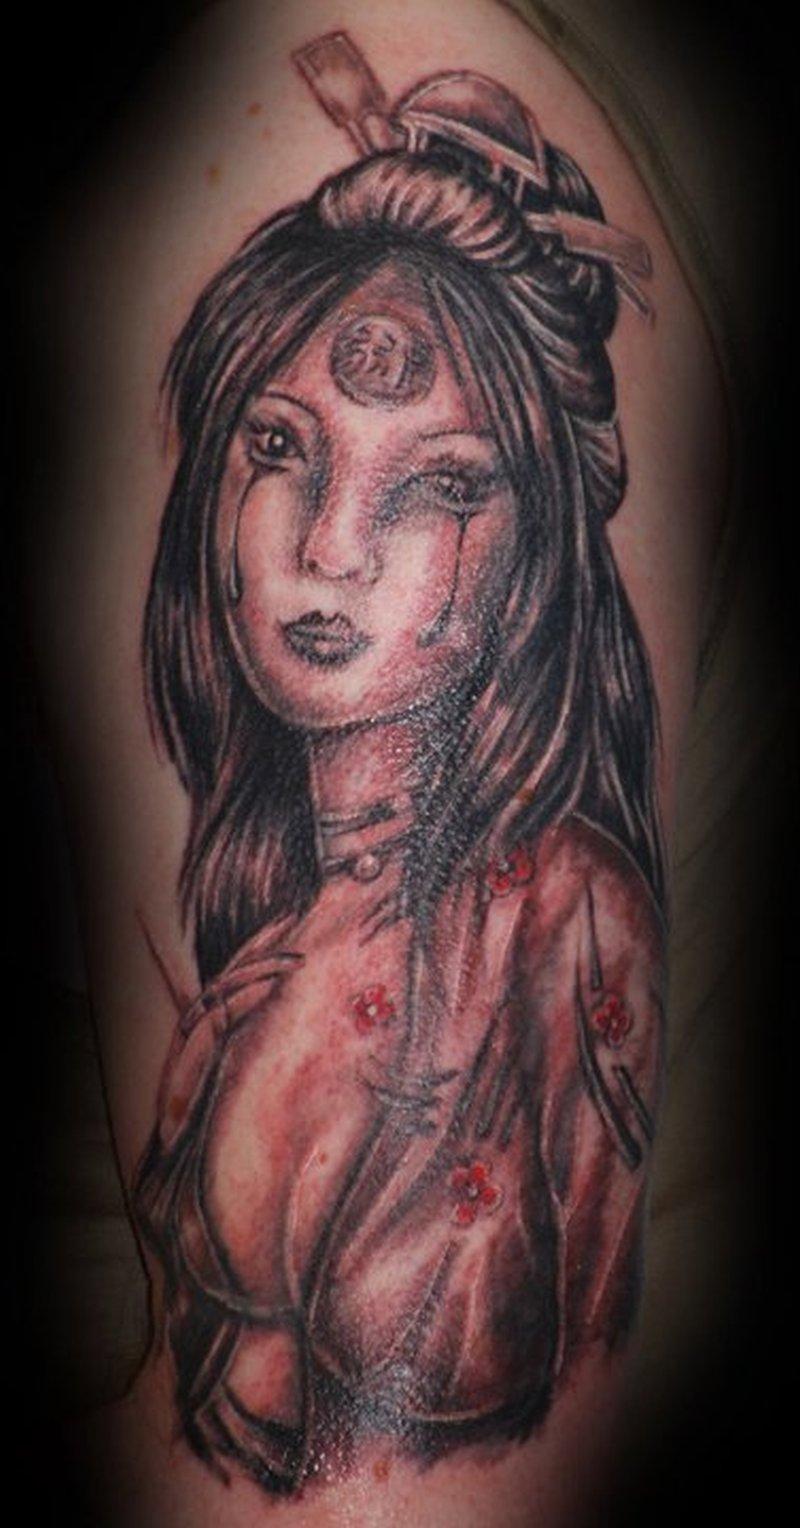 Crying geisha tattoo image